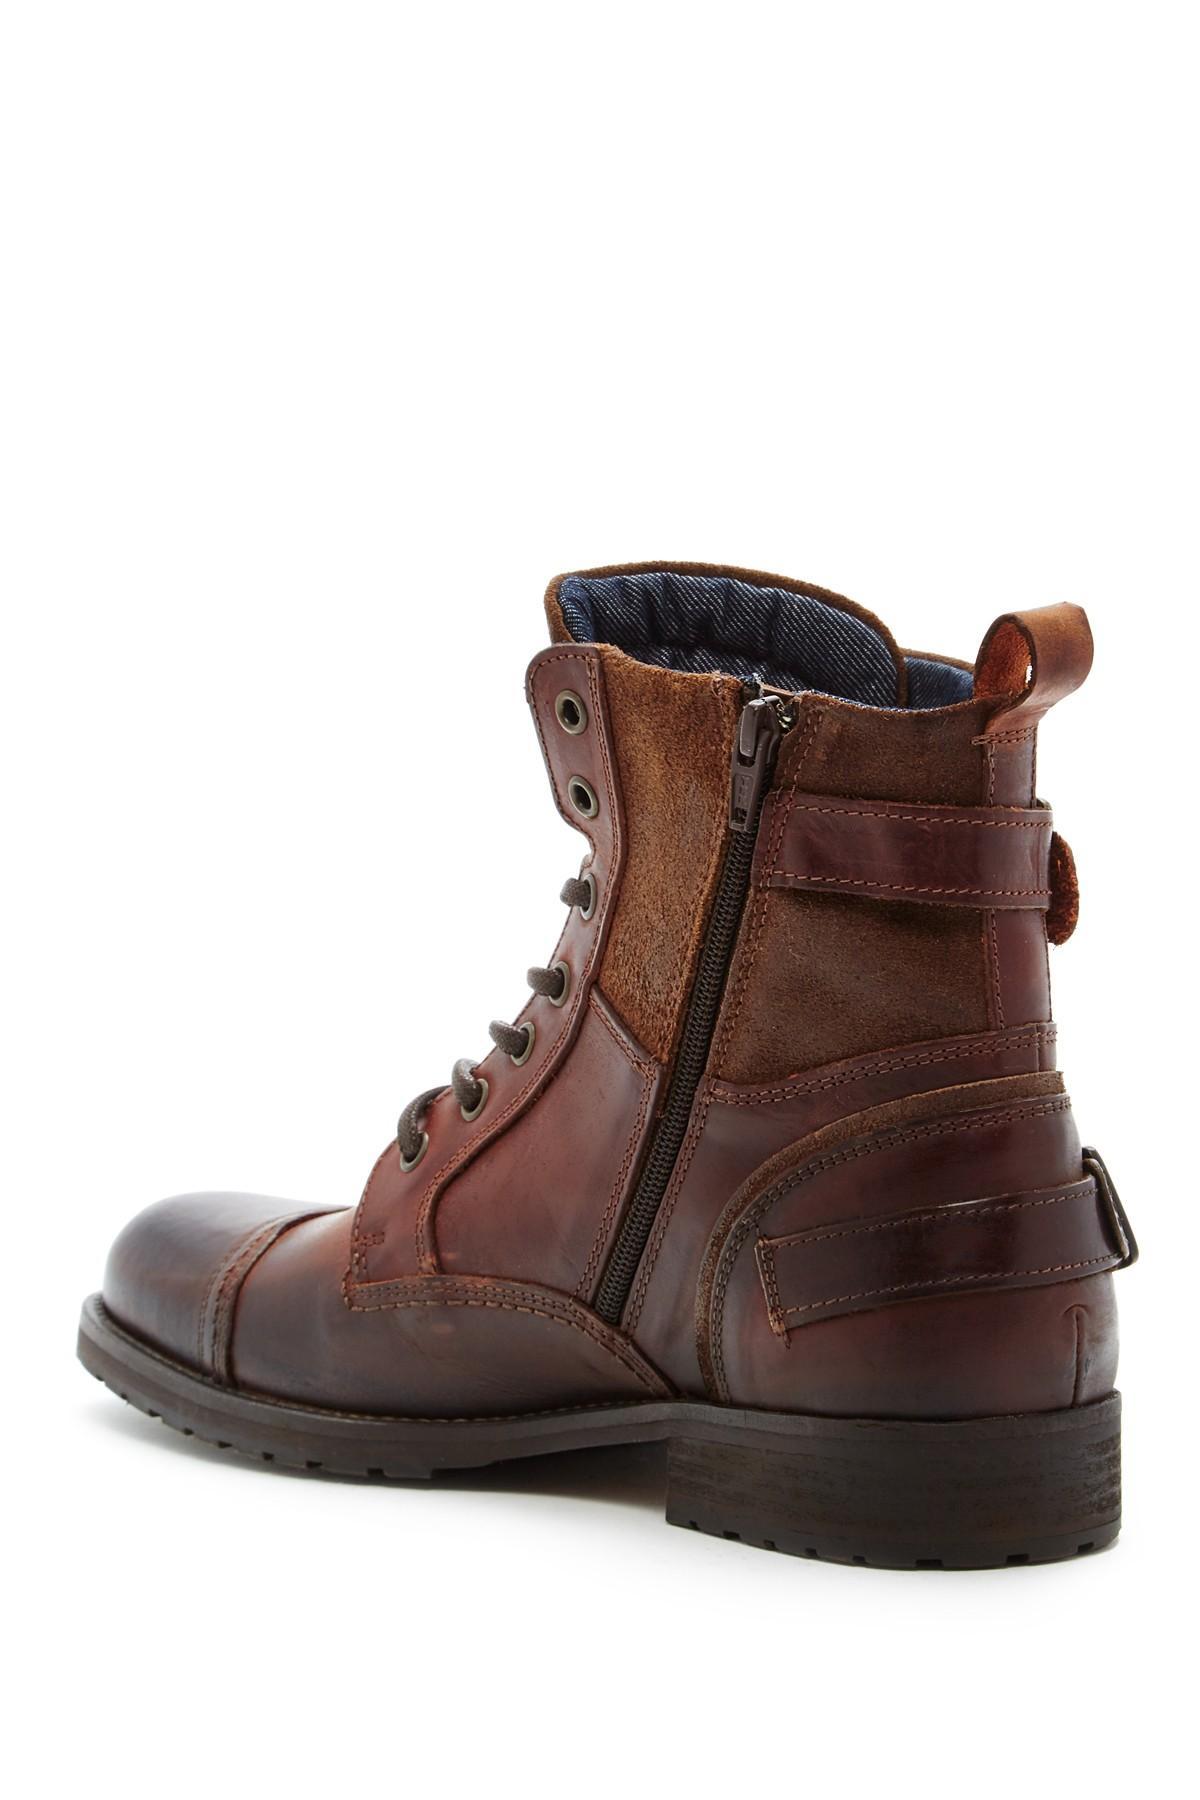 aldo gerrade boots, OFF 79%,Free Shipping,